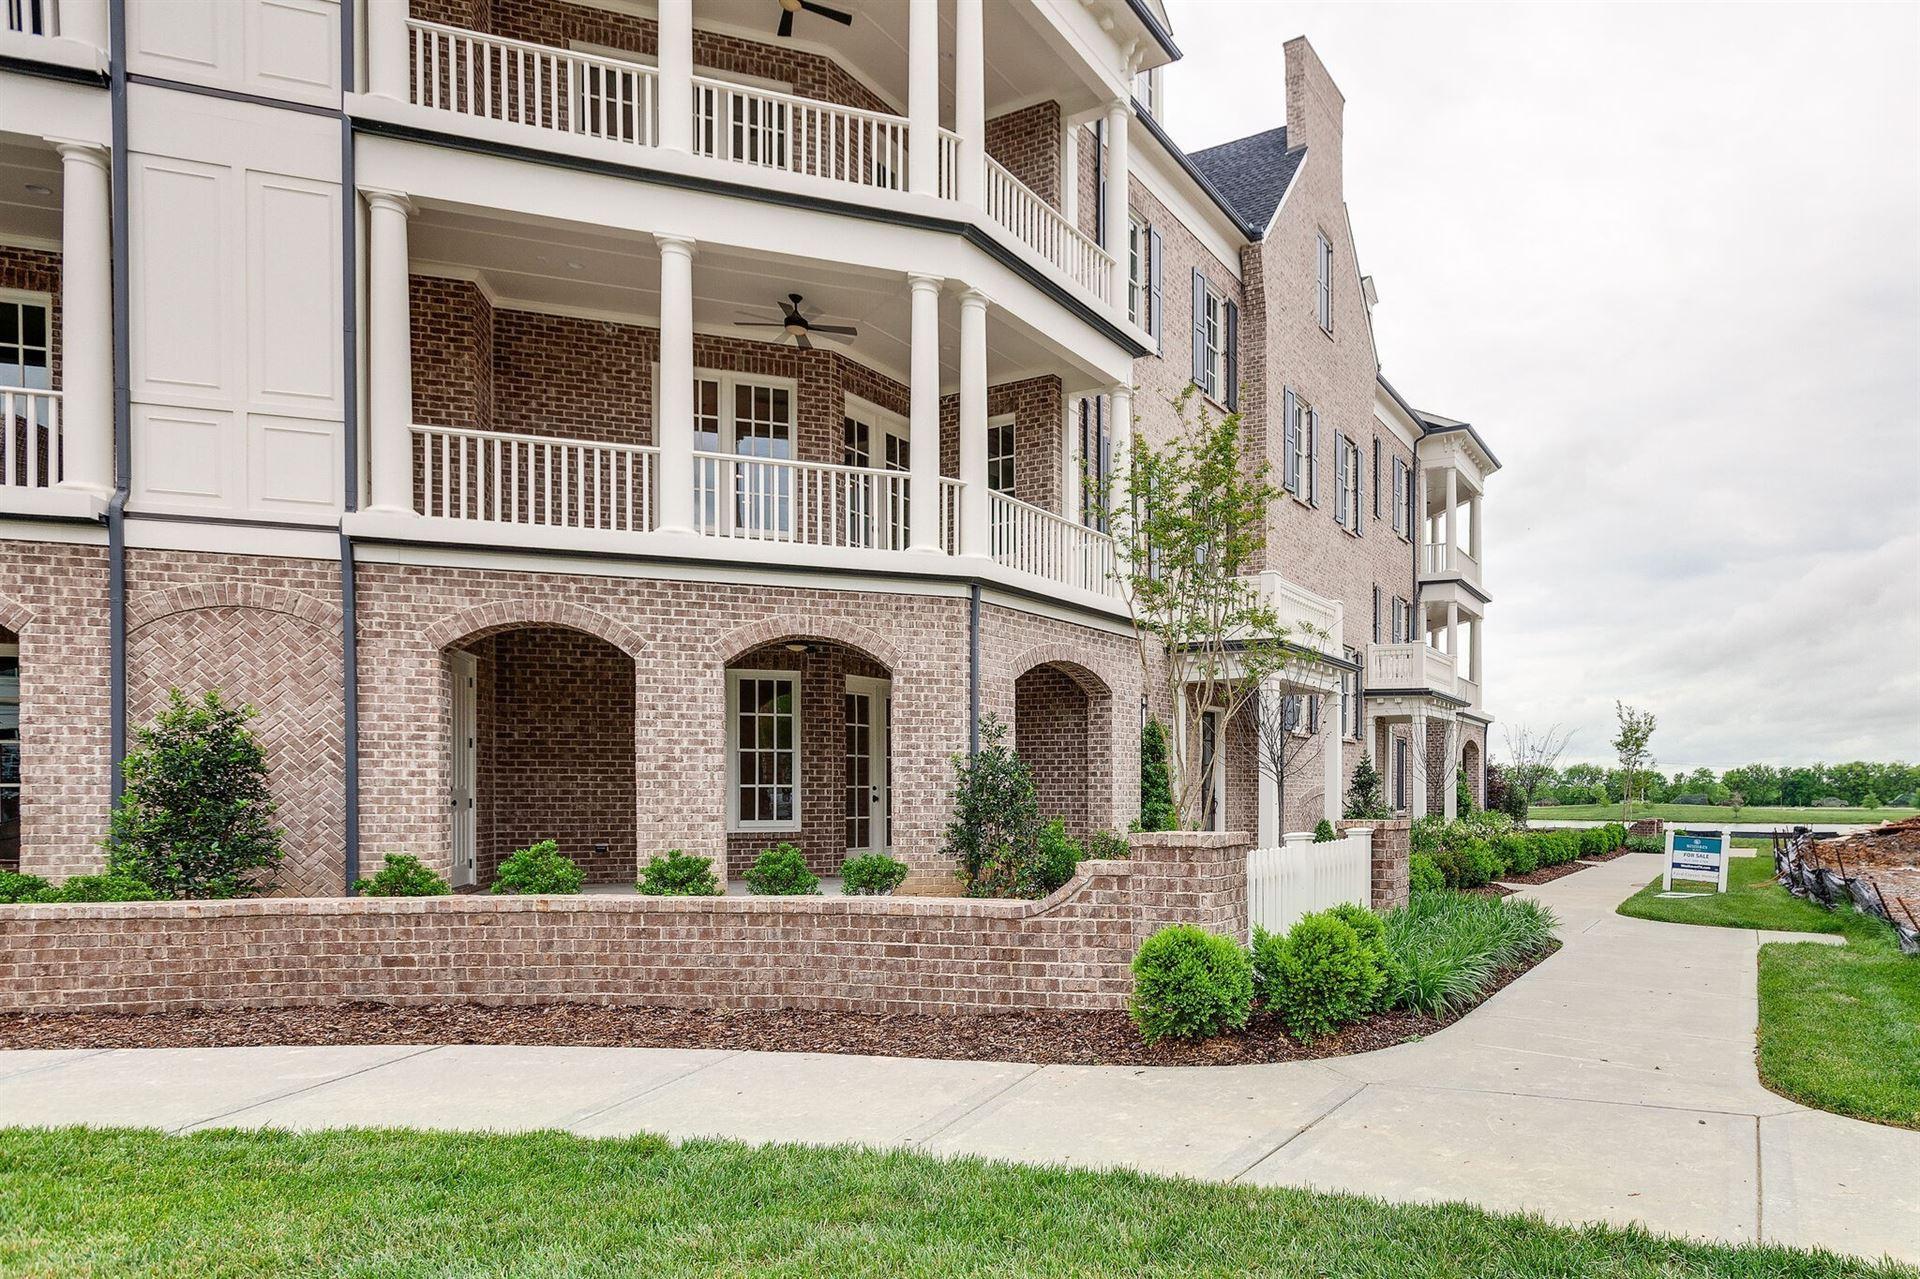 113 Front Street, WH # 4059, Franklin, TN 37064 - MLS#: 2198650